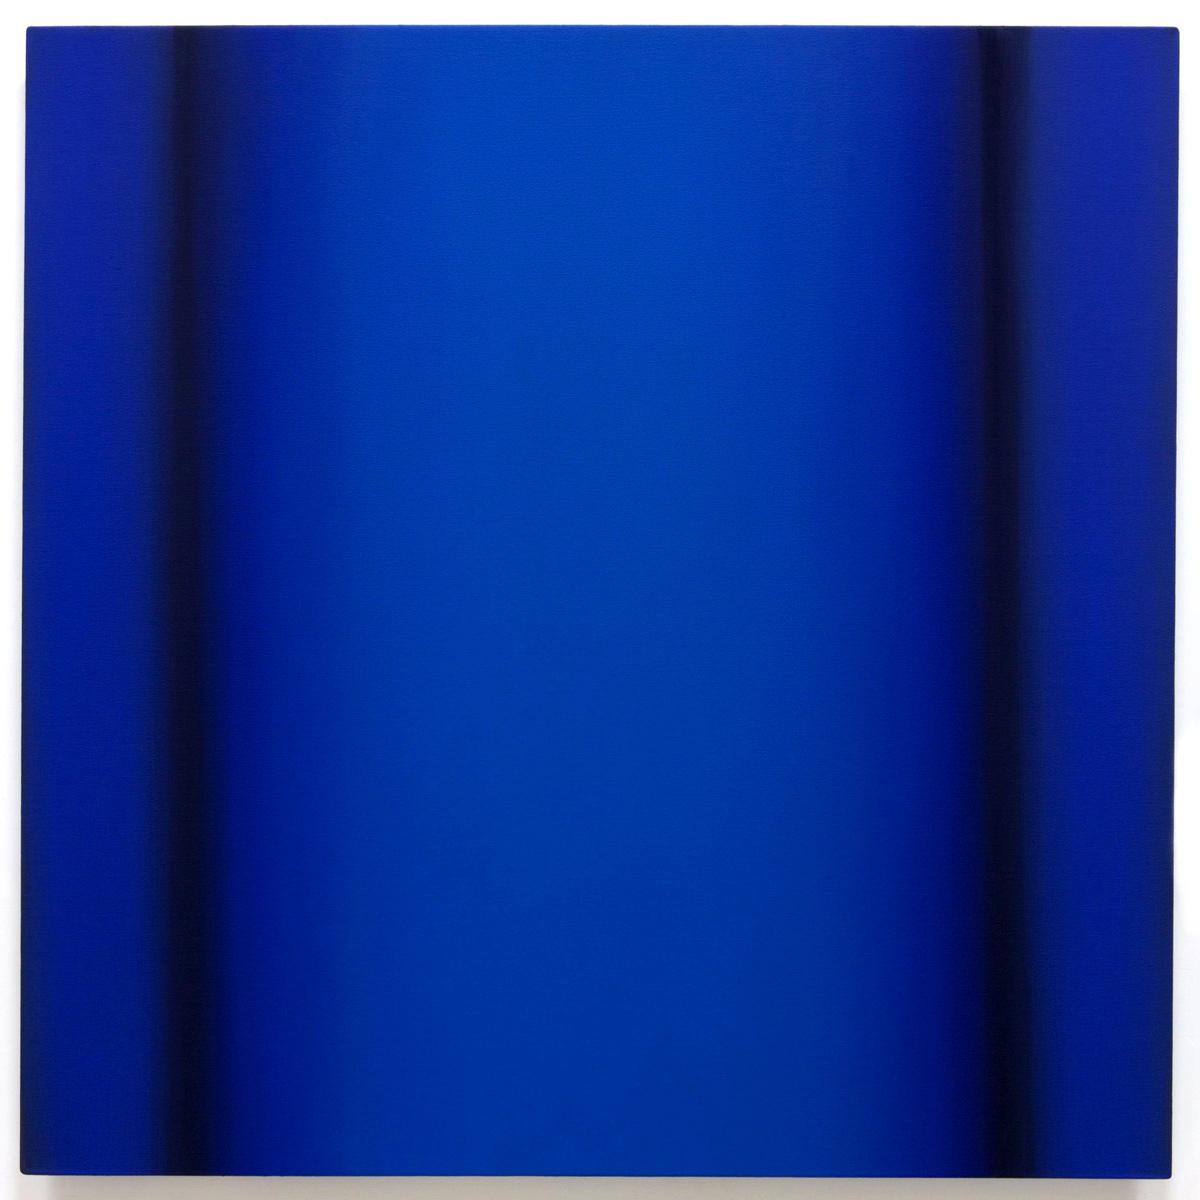 Blue Orange 1-S4848 (Blue Deep), Interplay Series, 2013, oil on canvas on custom beveled stretcher, 48 x 48 x 3 in. (122 x 122 x 7 cm.)